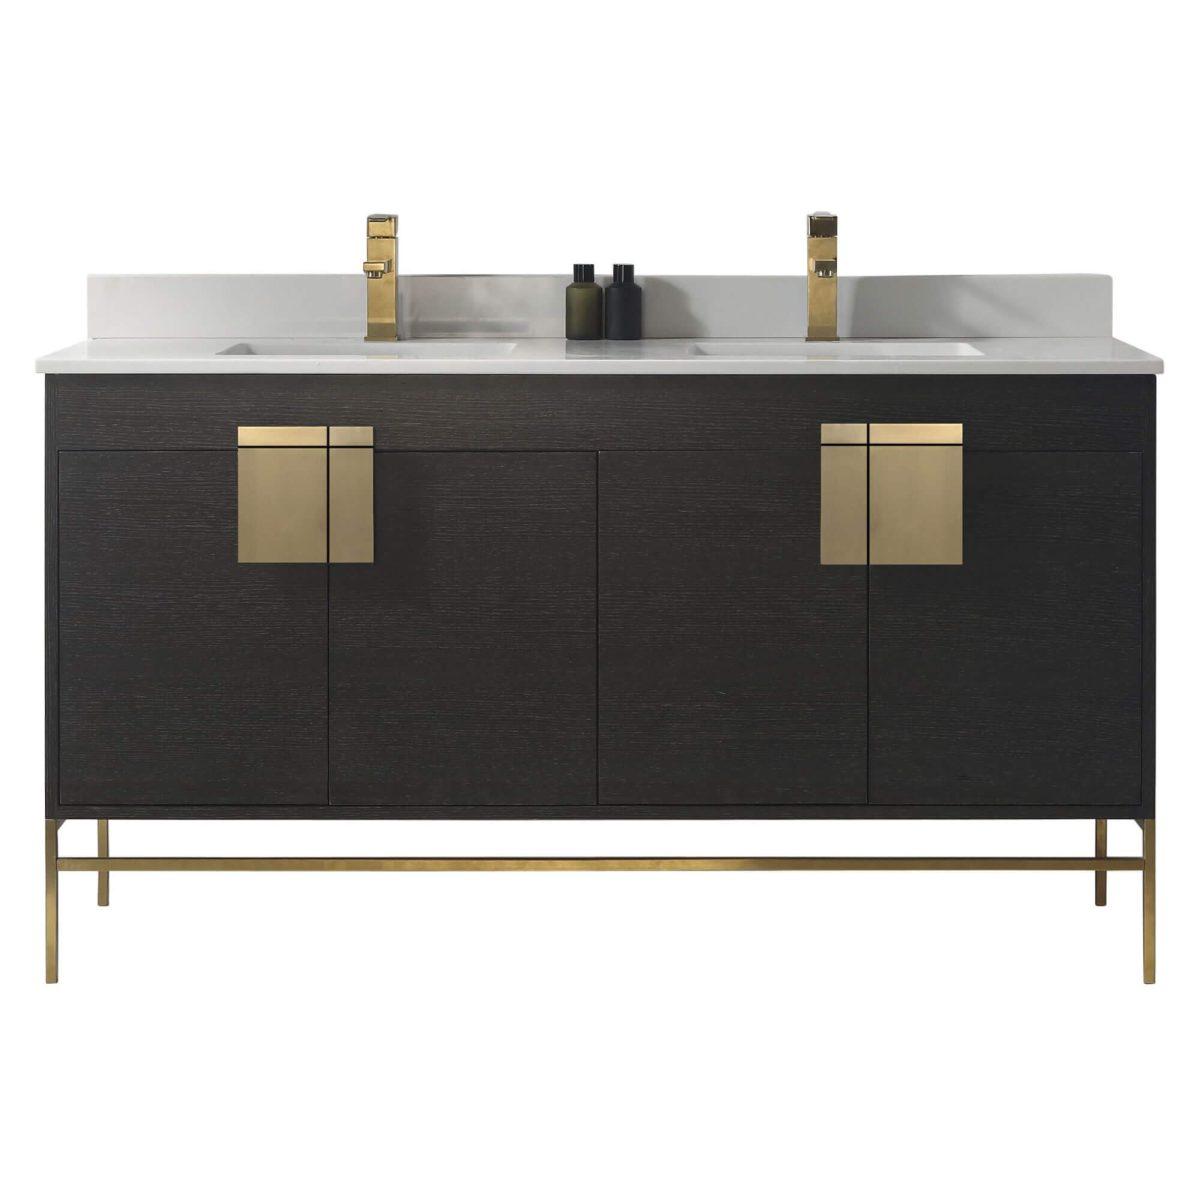 "Shawbridge 60"" Modern Double Bathroom Vanity  Black Oak Straight Grain with Satin Brass Hardware"